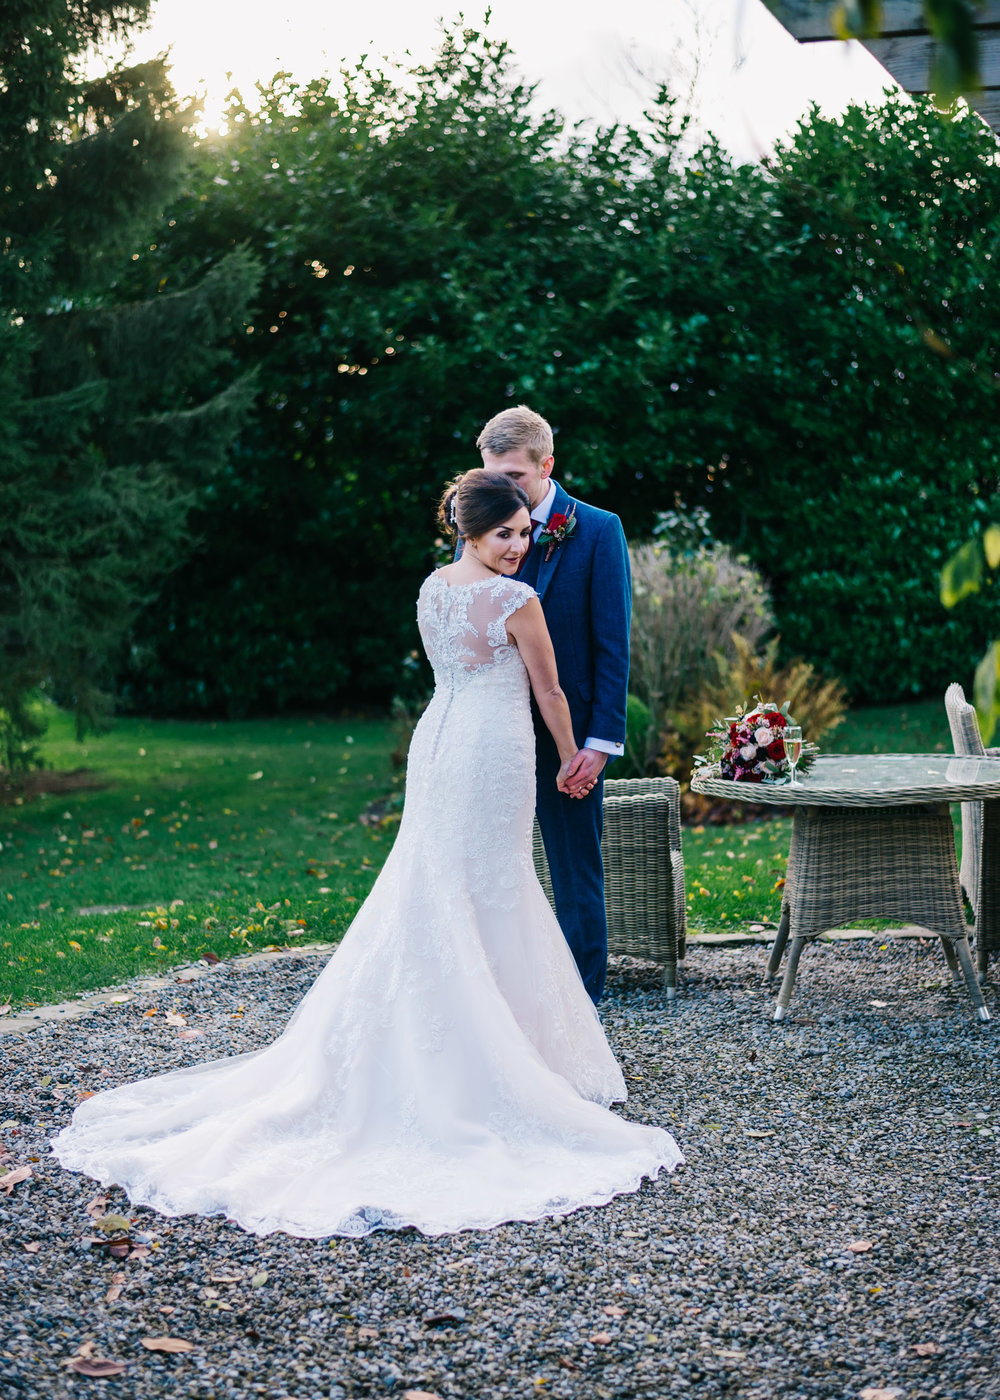 Ribble Valley Wedding Photographer - Shireburn Arms Lancashire